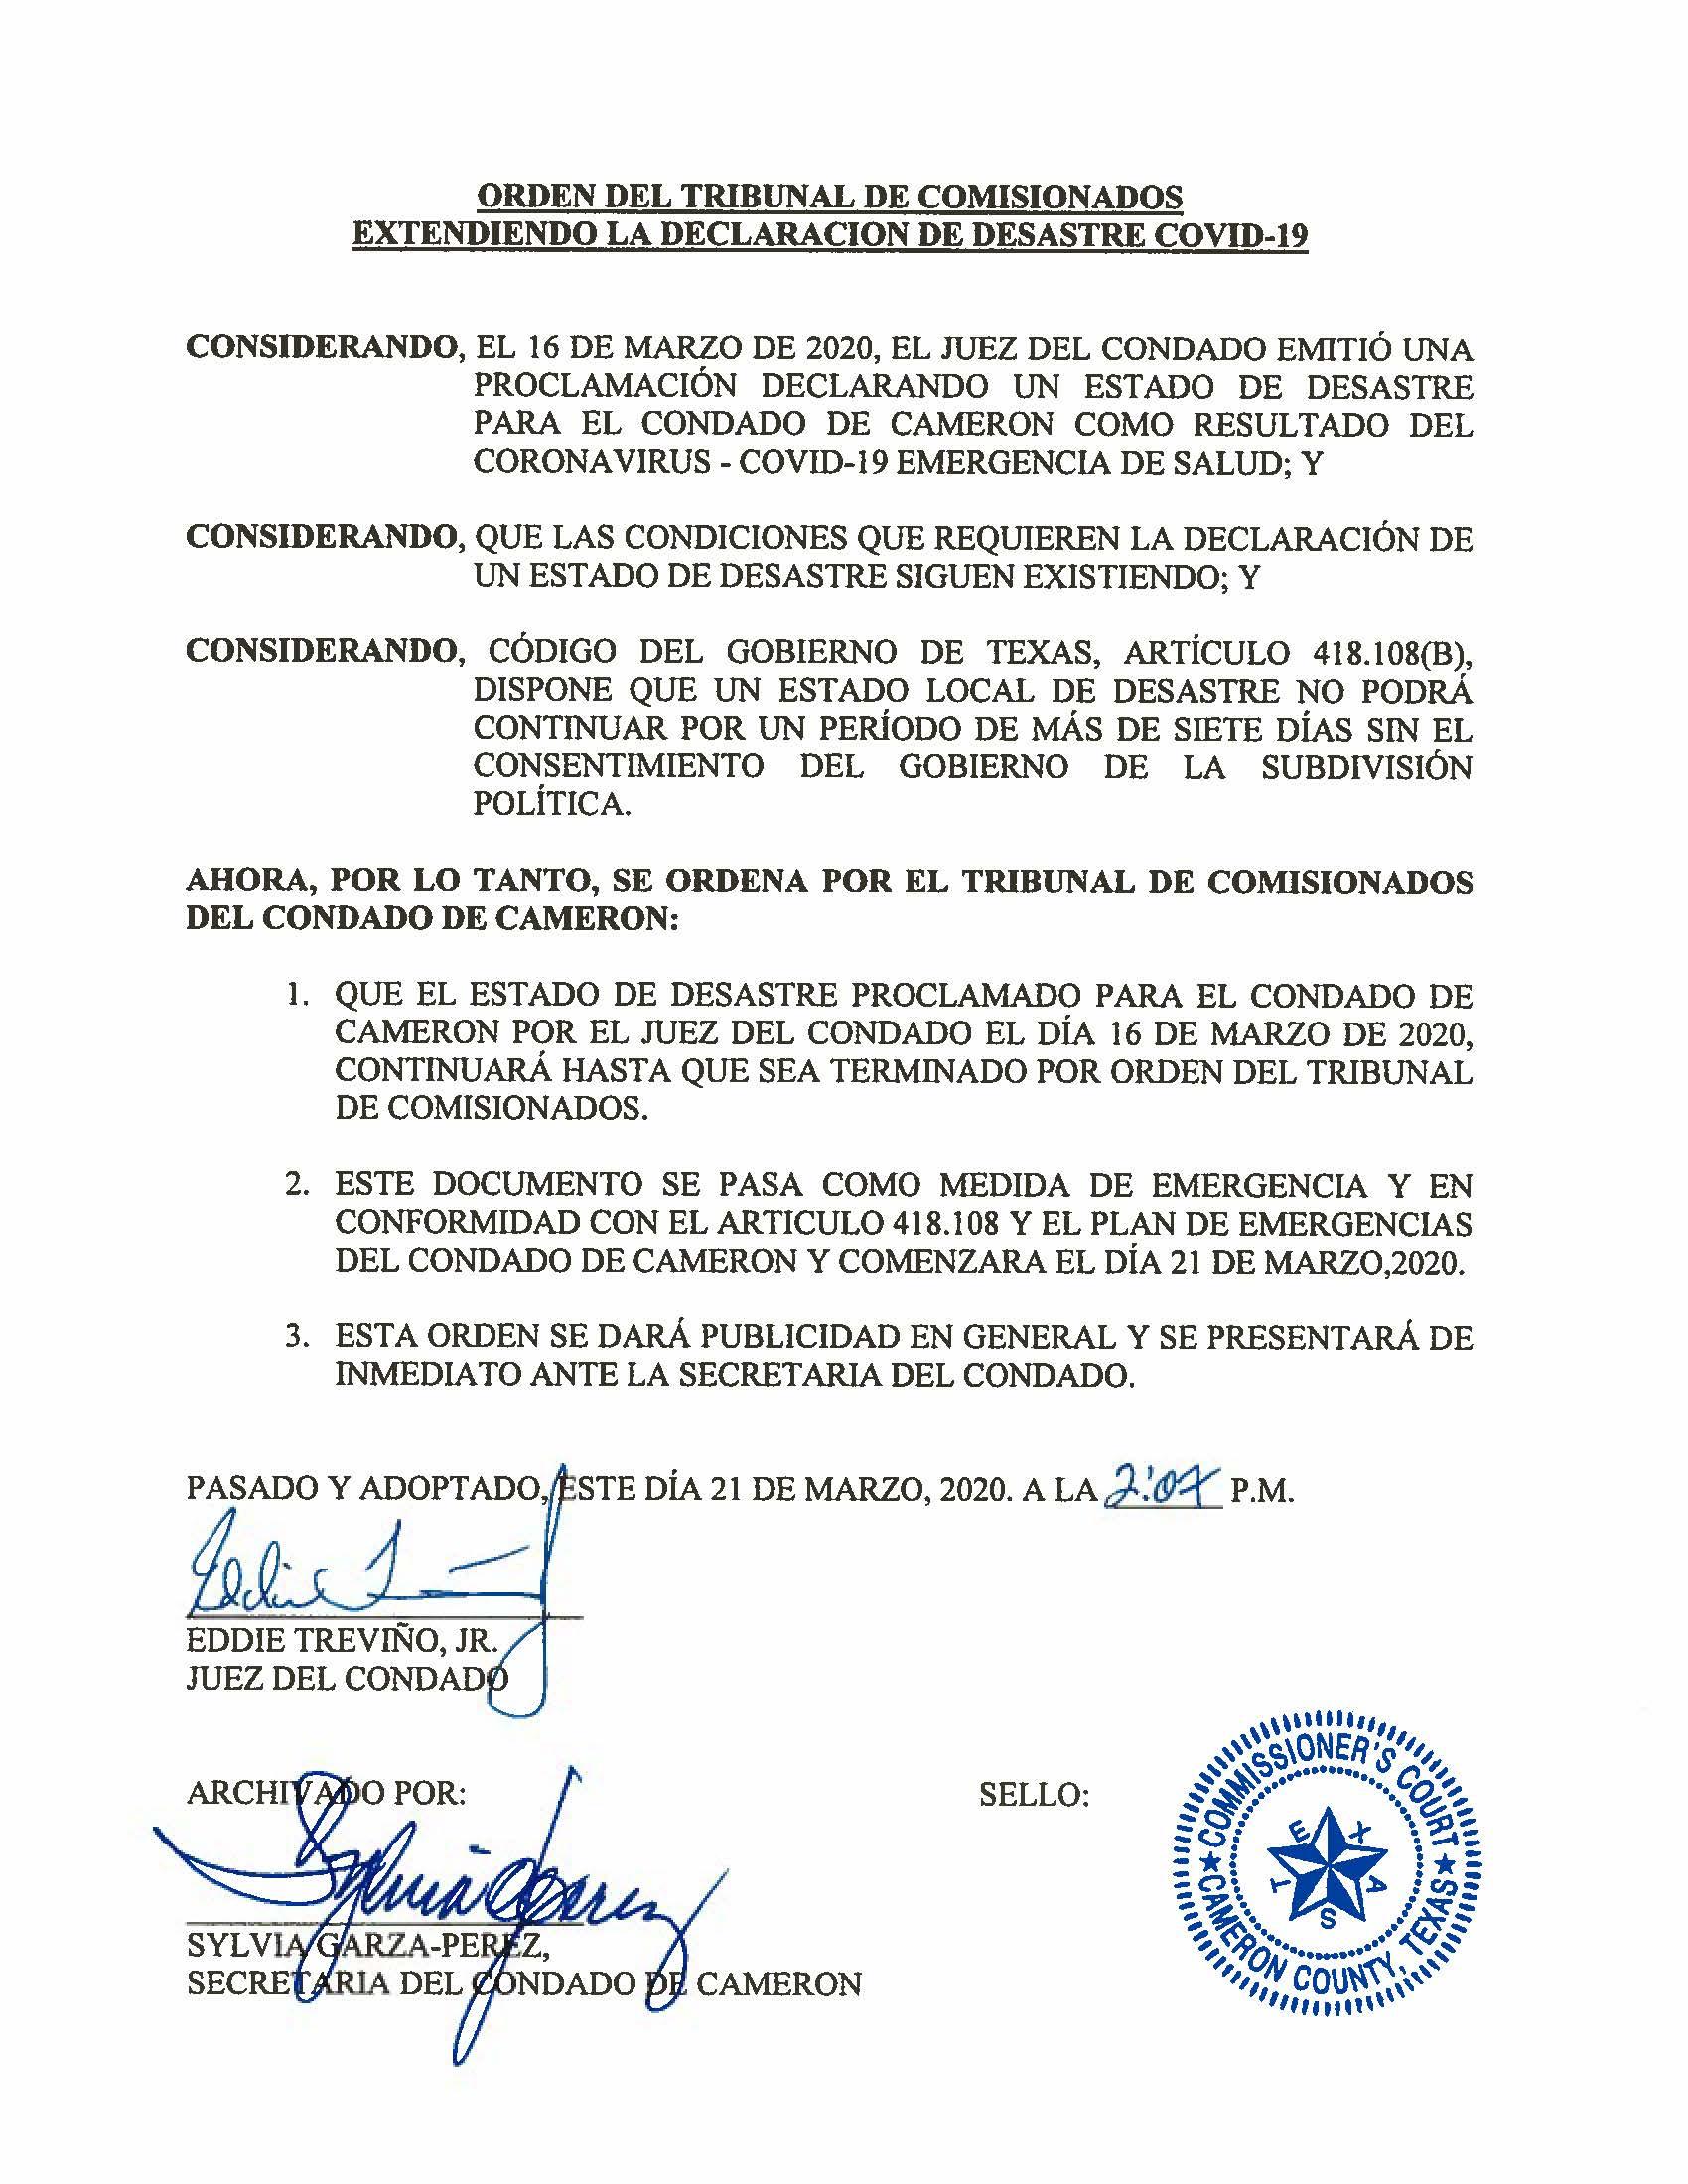 03.21.2020 Orden De Extension